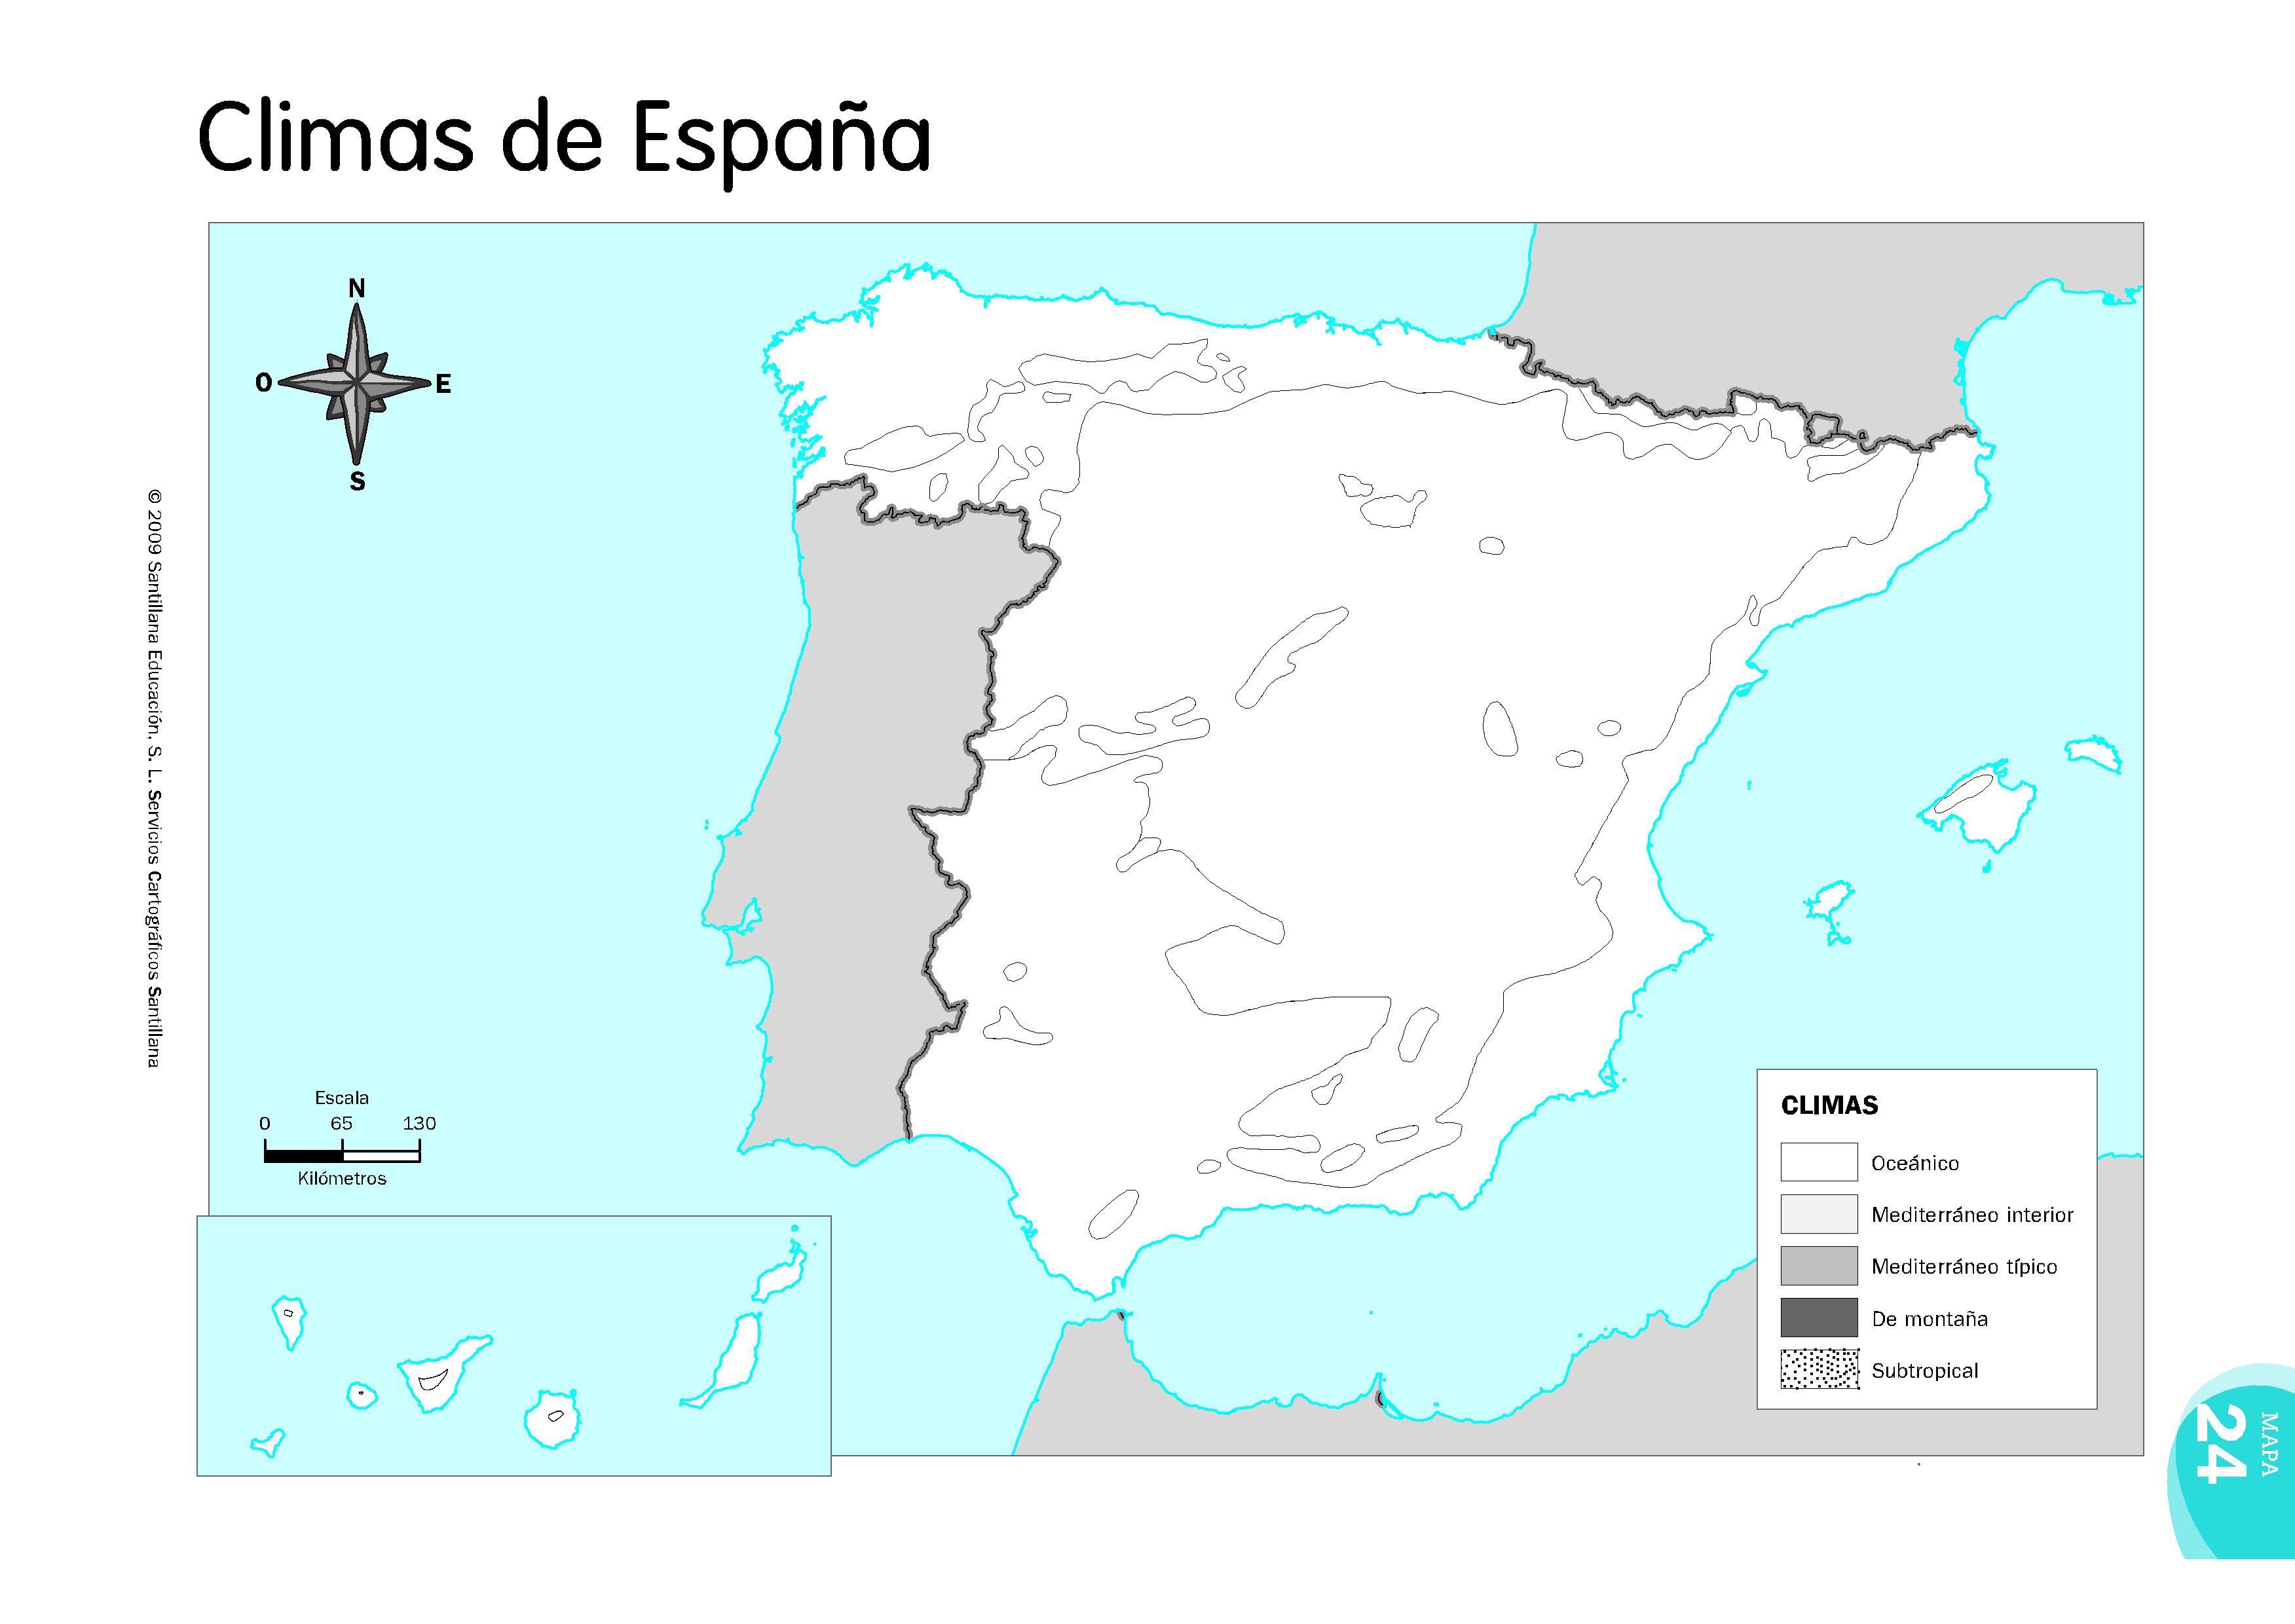 Mapa Climatico De España Mudo.Mapas De Espana Fisicos Politicos Y Mudos Mapa Fisico De